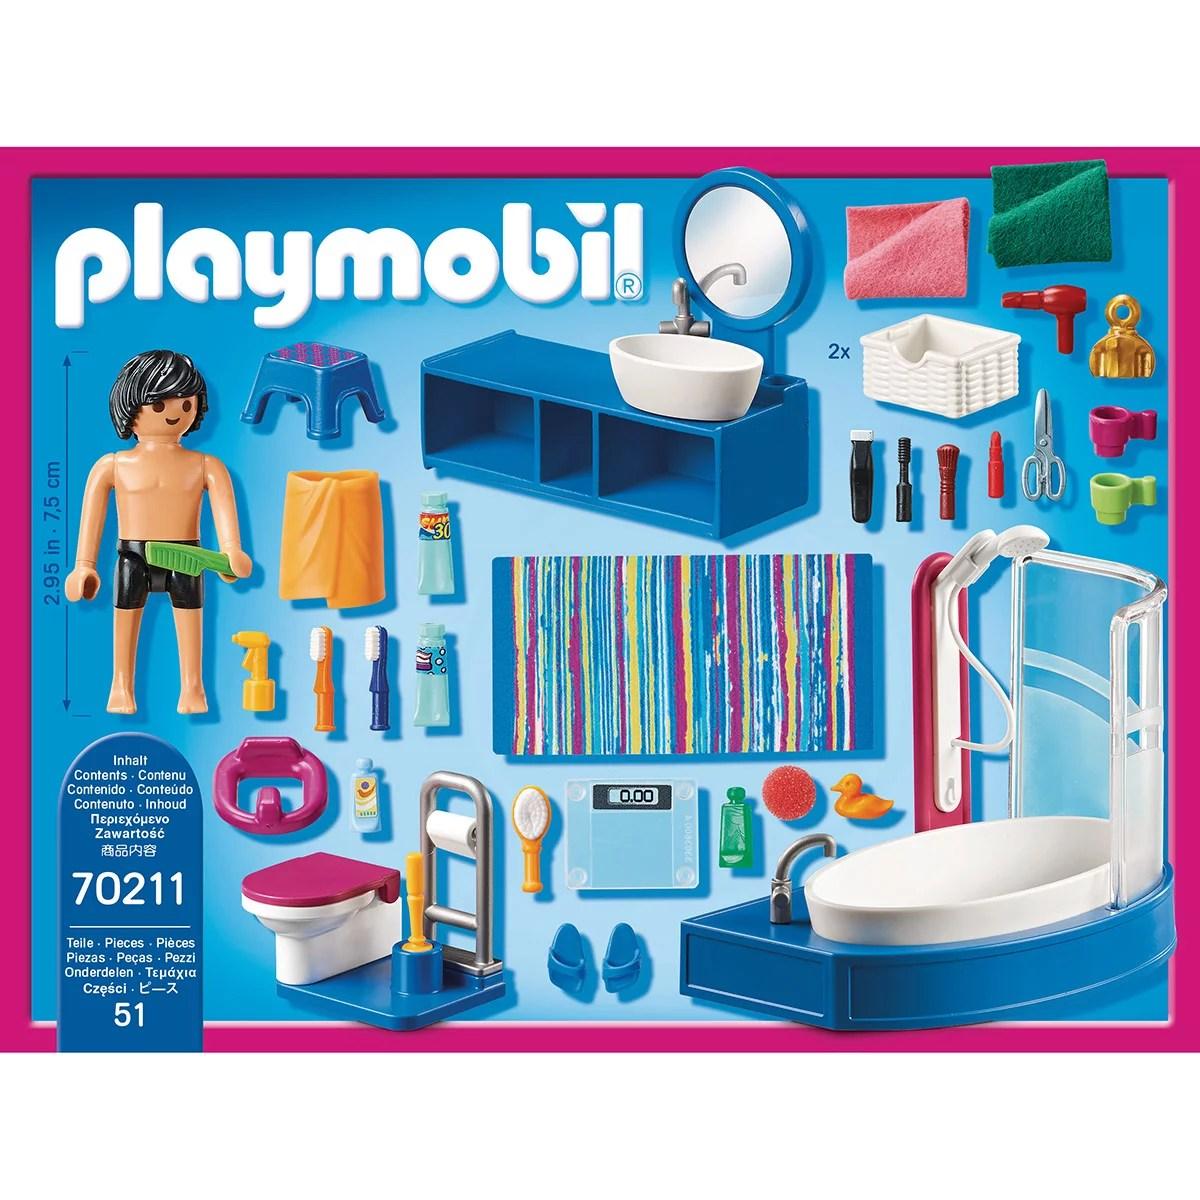 salle de bain avec baignoire playmobil dollhouse 70211